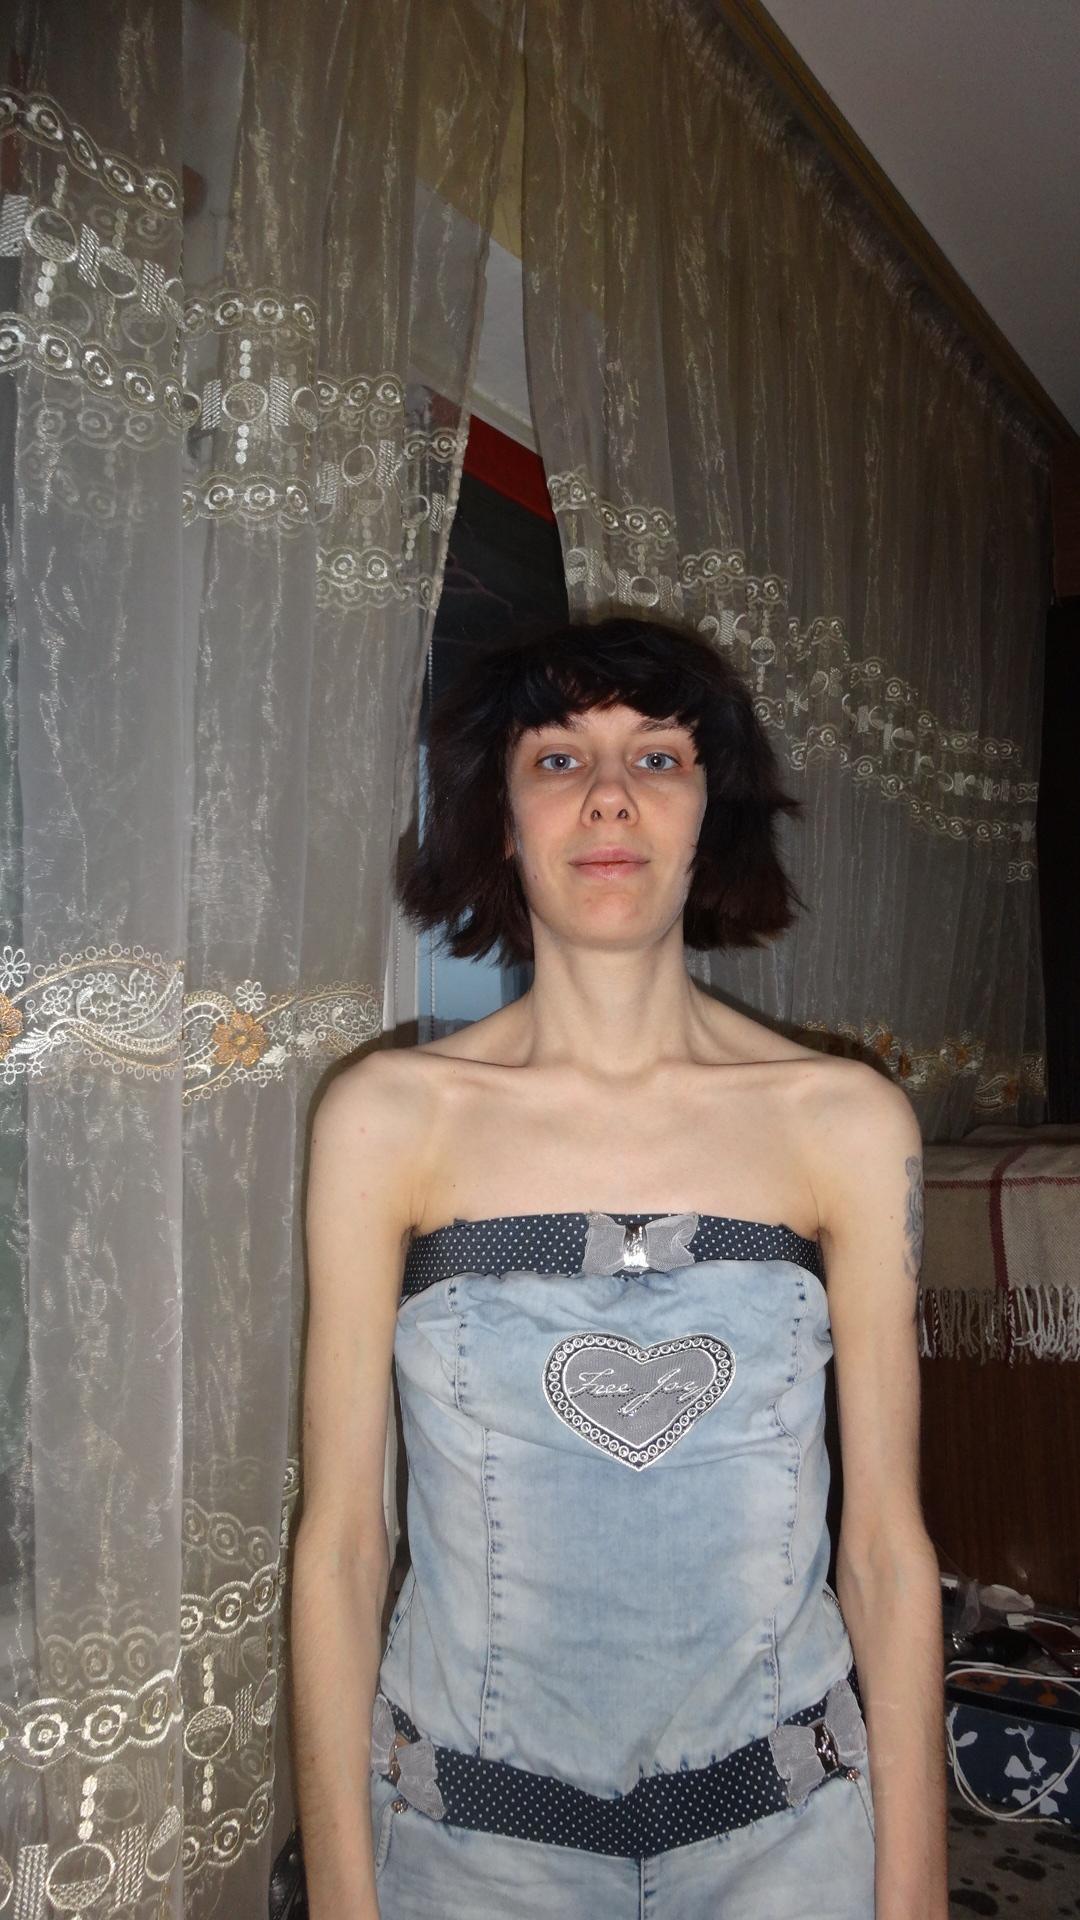 user1274, Евгения, 32, Королев